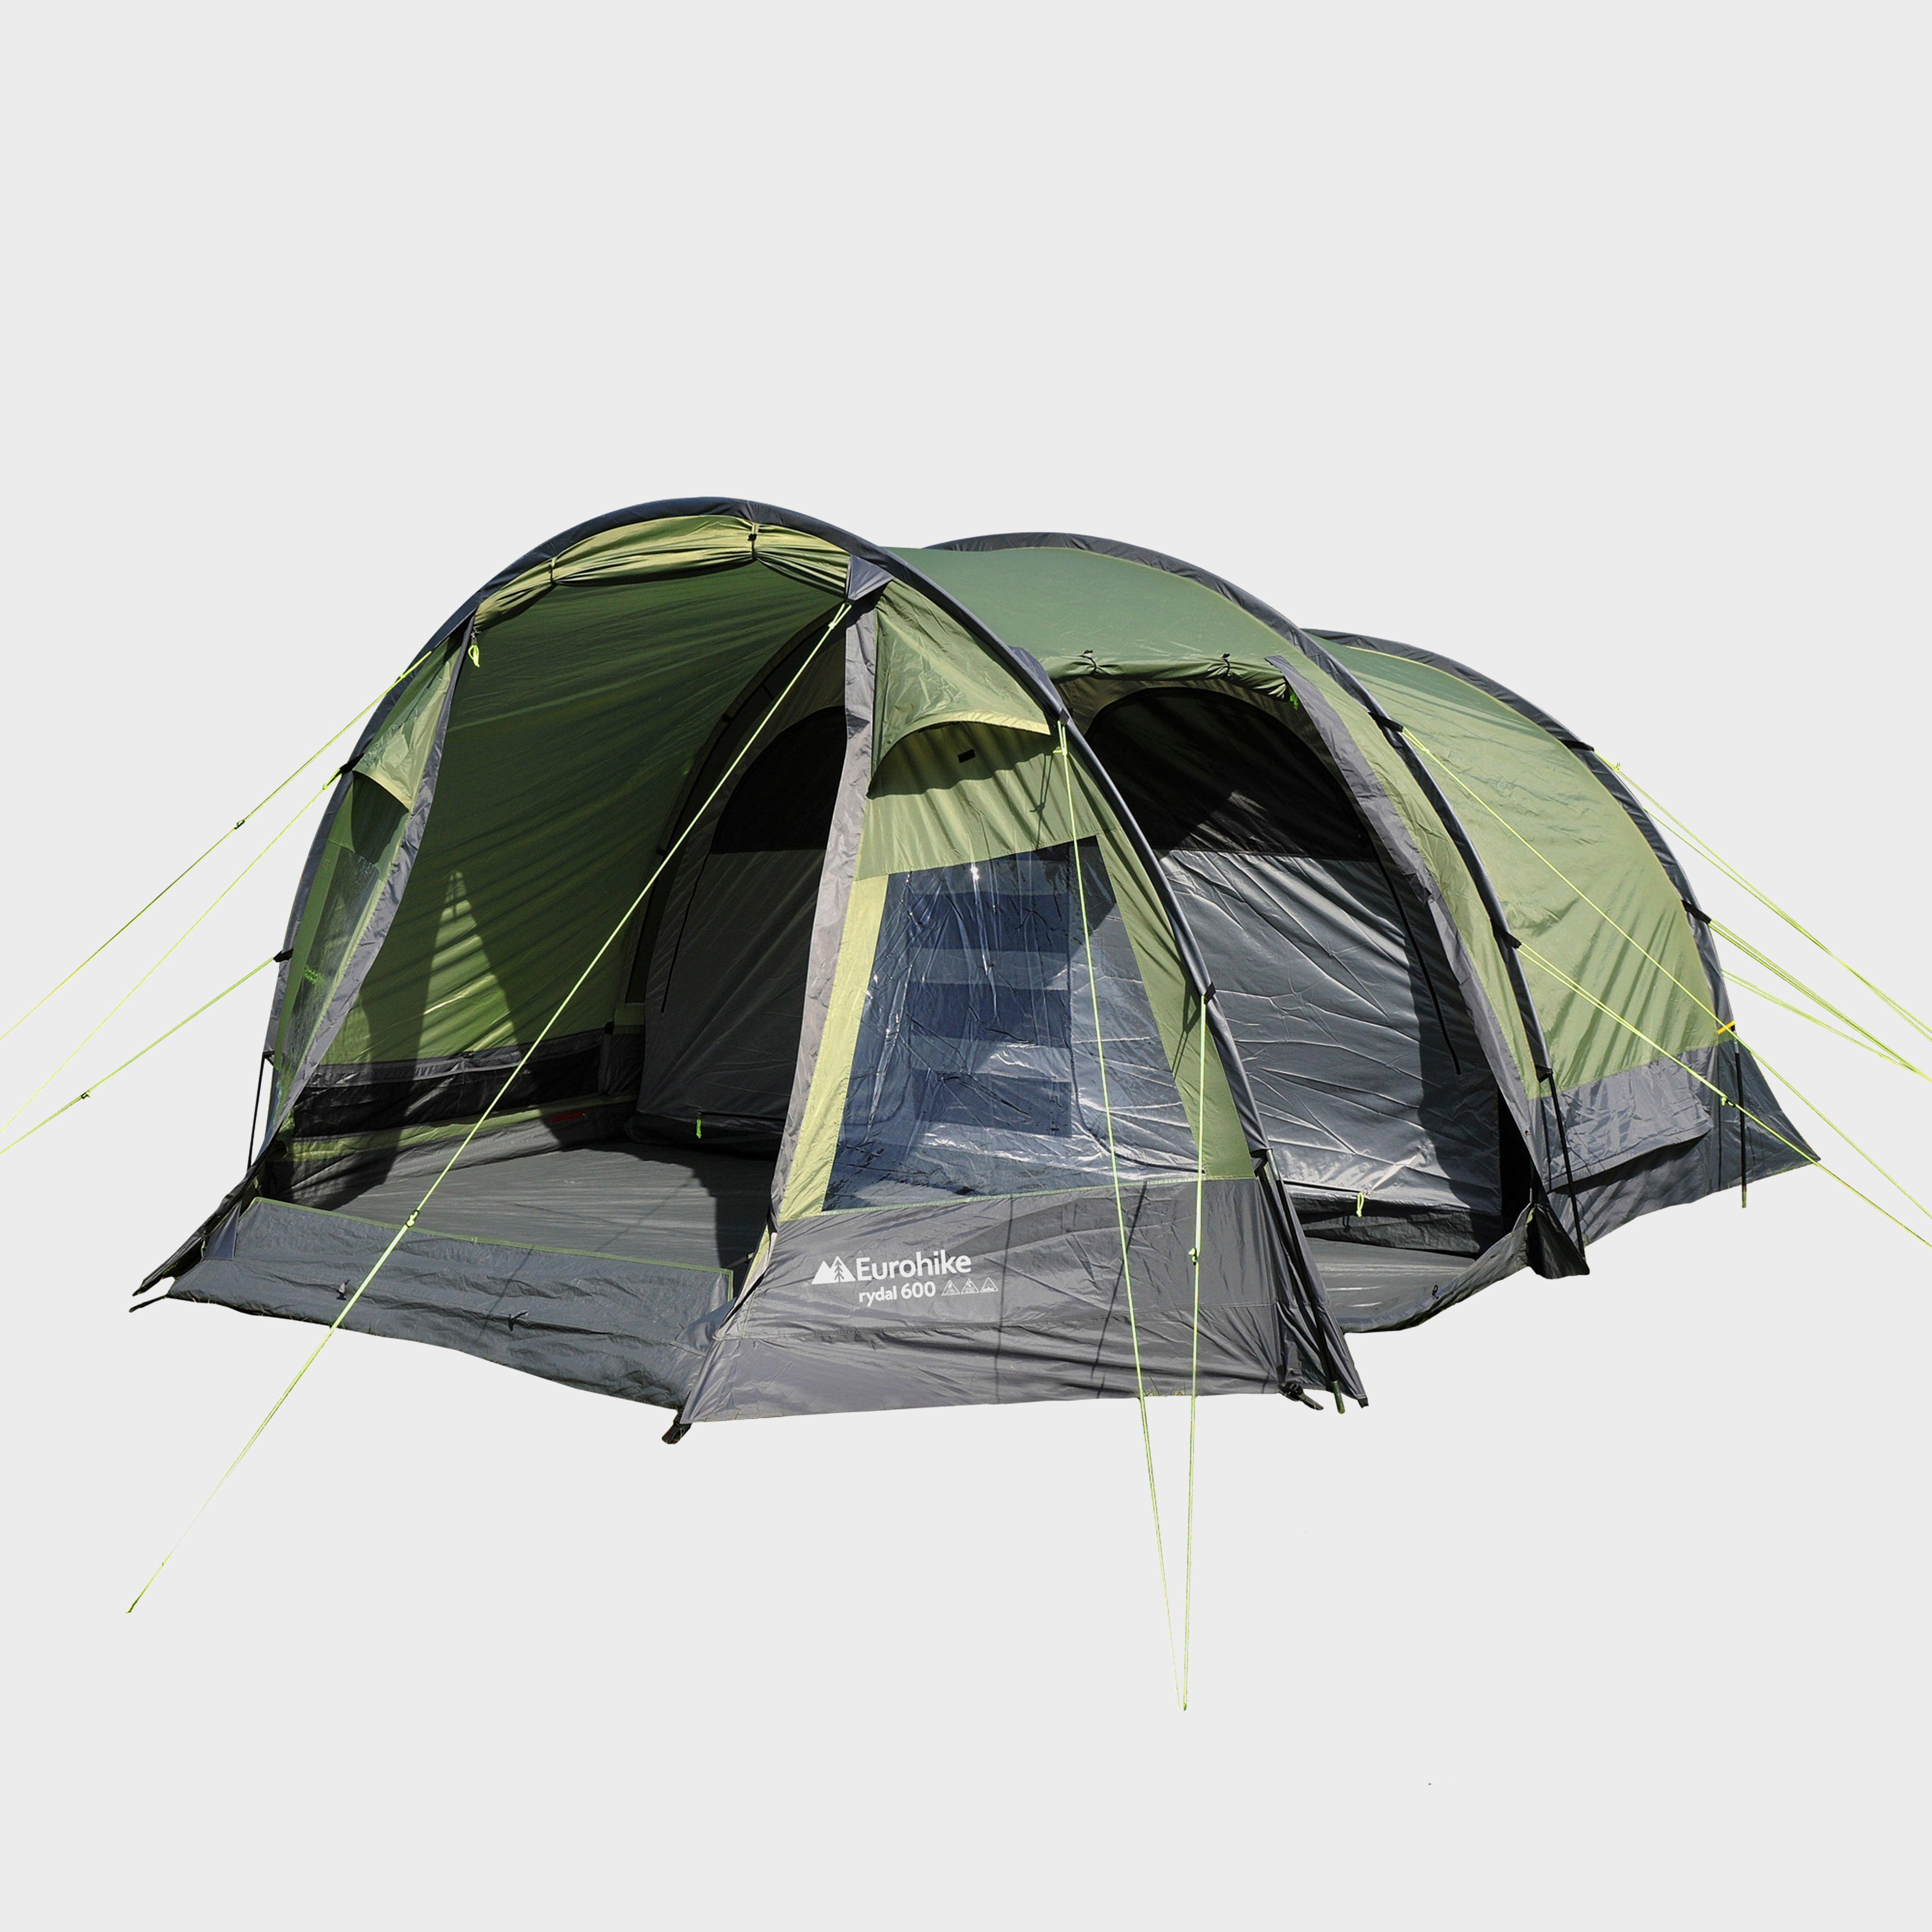 Eurohike Rydal 600 6 Man Tent & Eurohike Rydal 600 6 Man Tent | Millet Sports